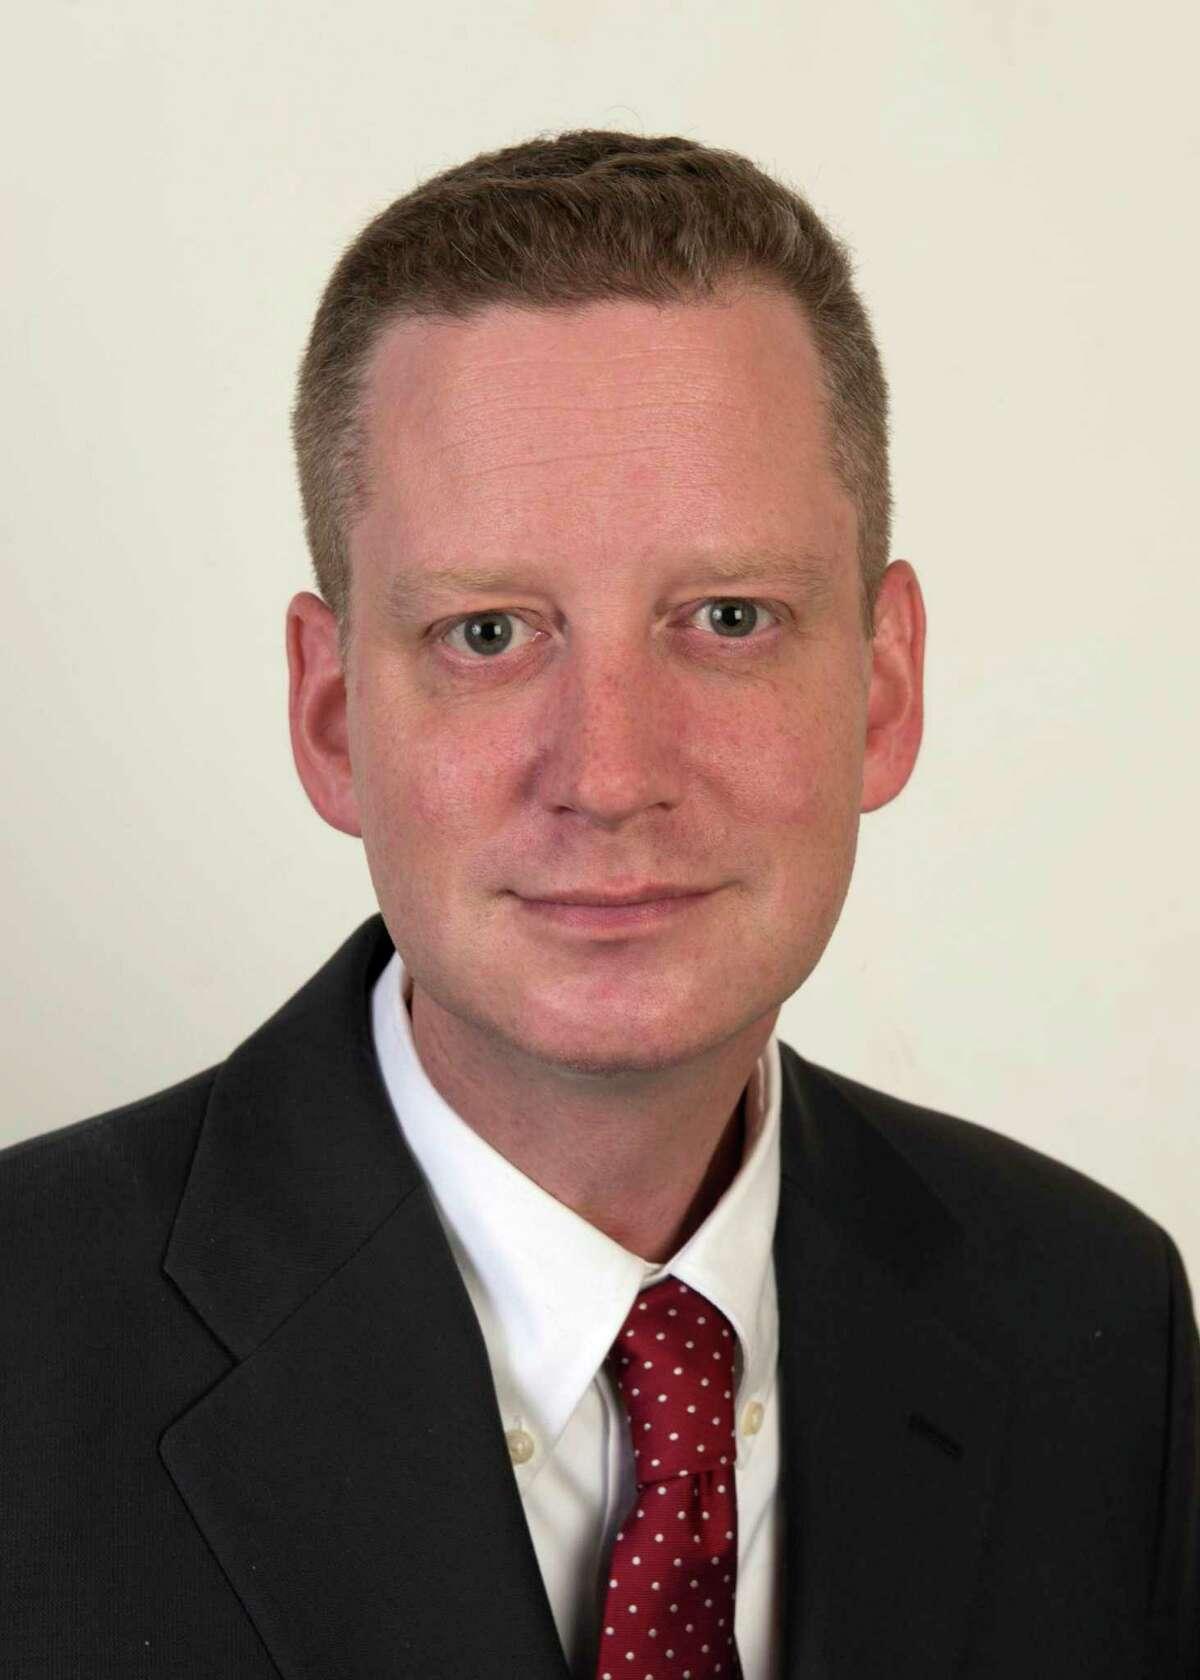 Daniel Nostin, Bethel Republican Board of Education candidate